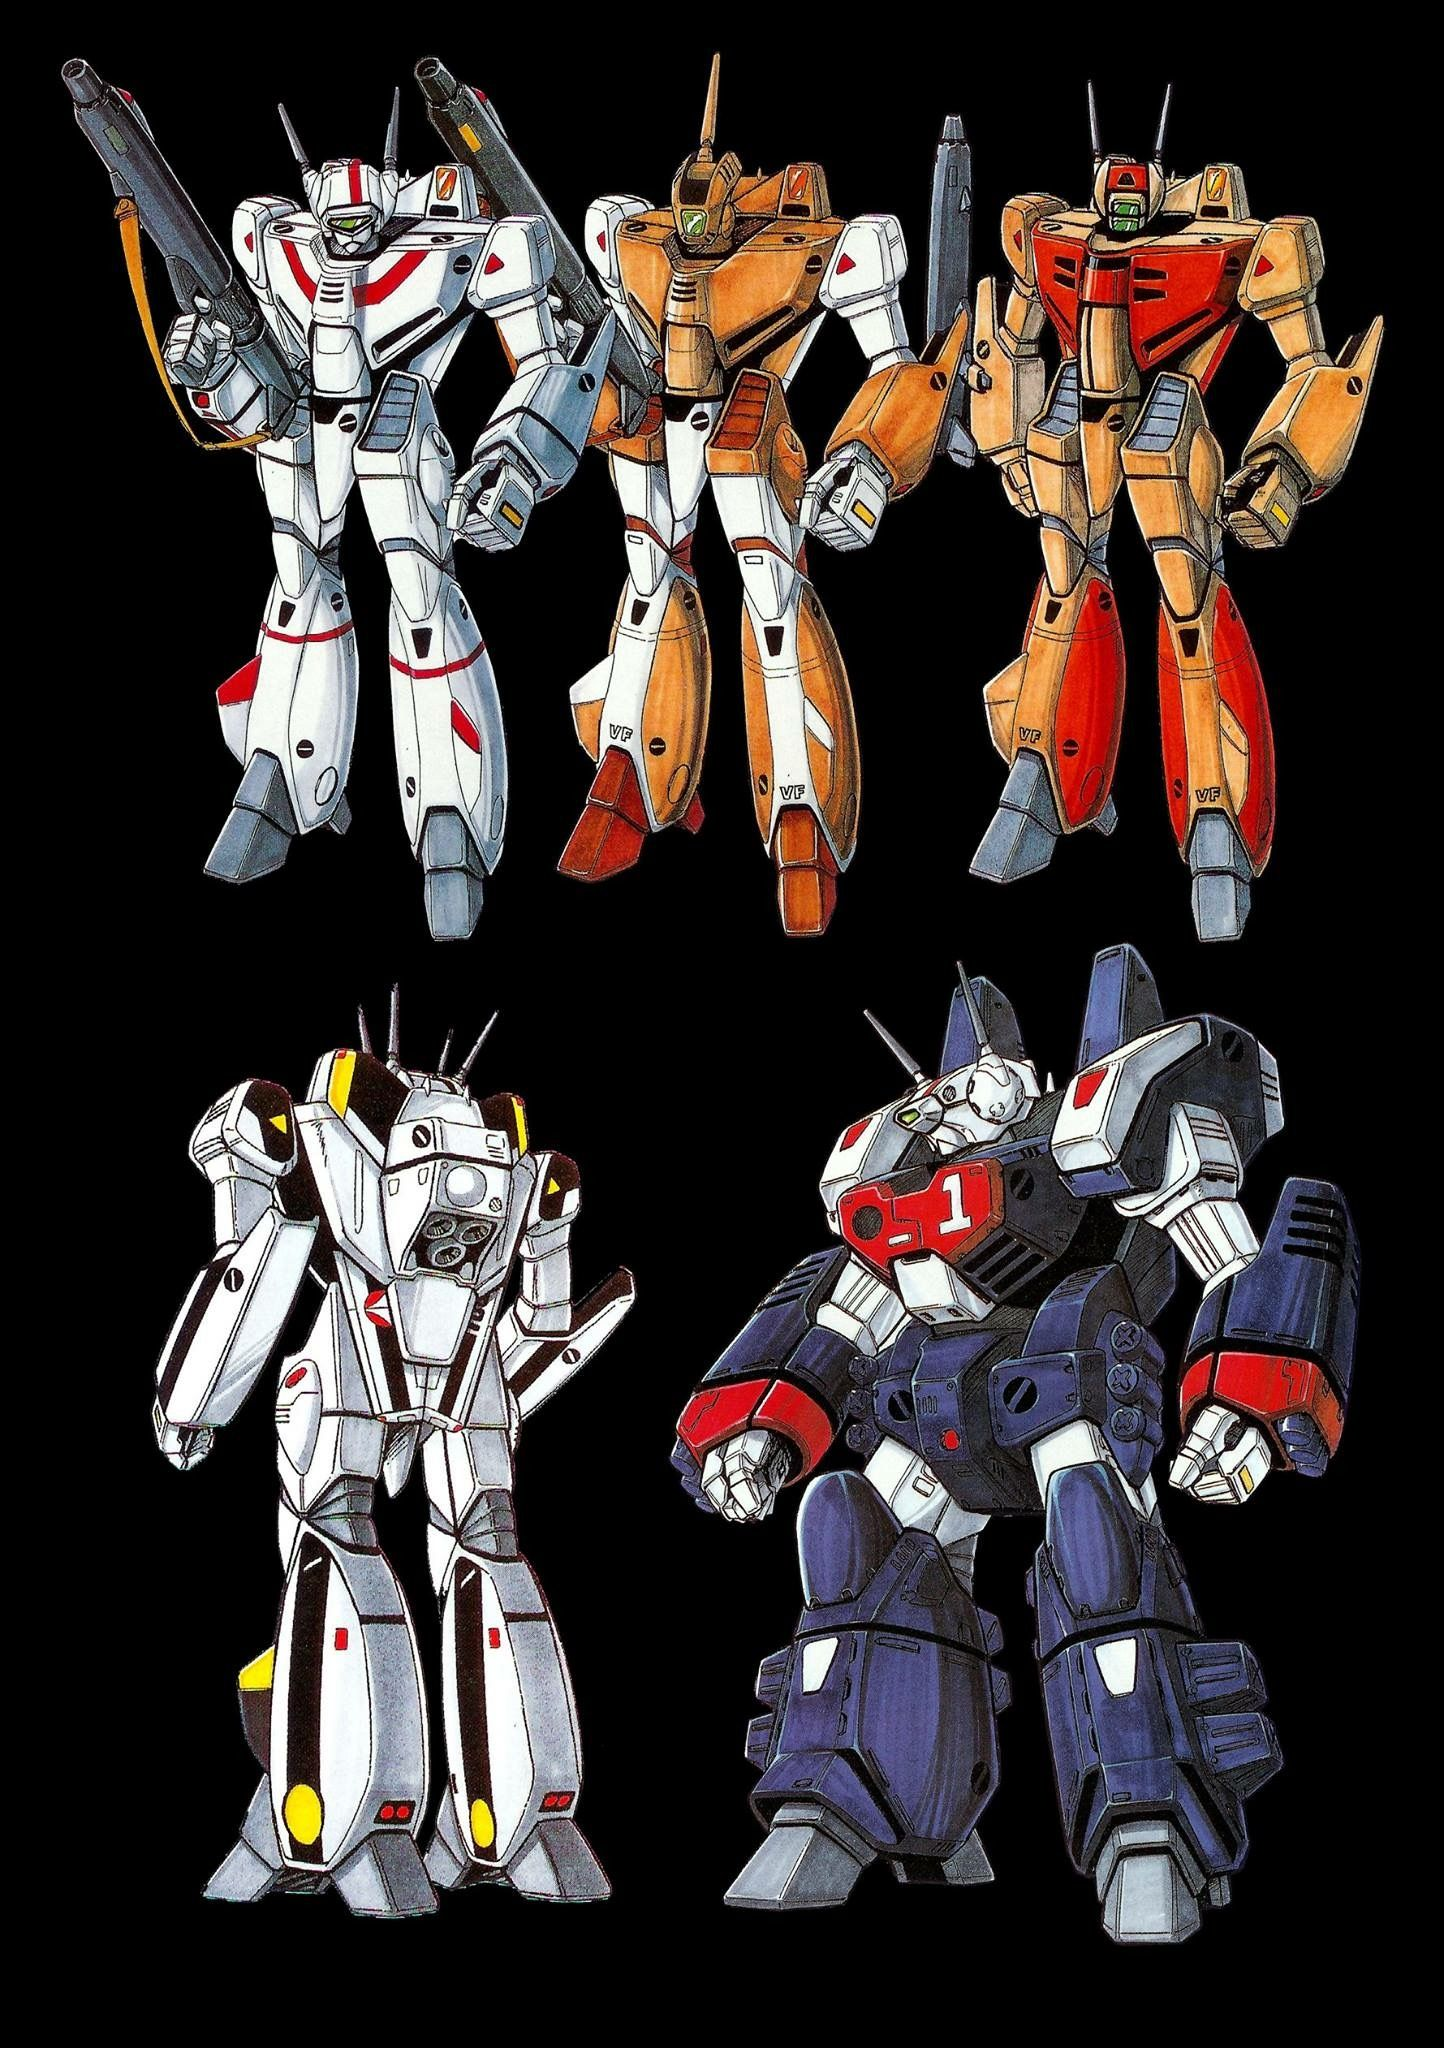 Macross Valkyries Robotech macross, Mecha anime, Robotech